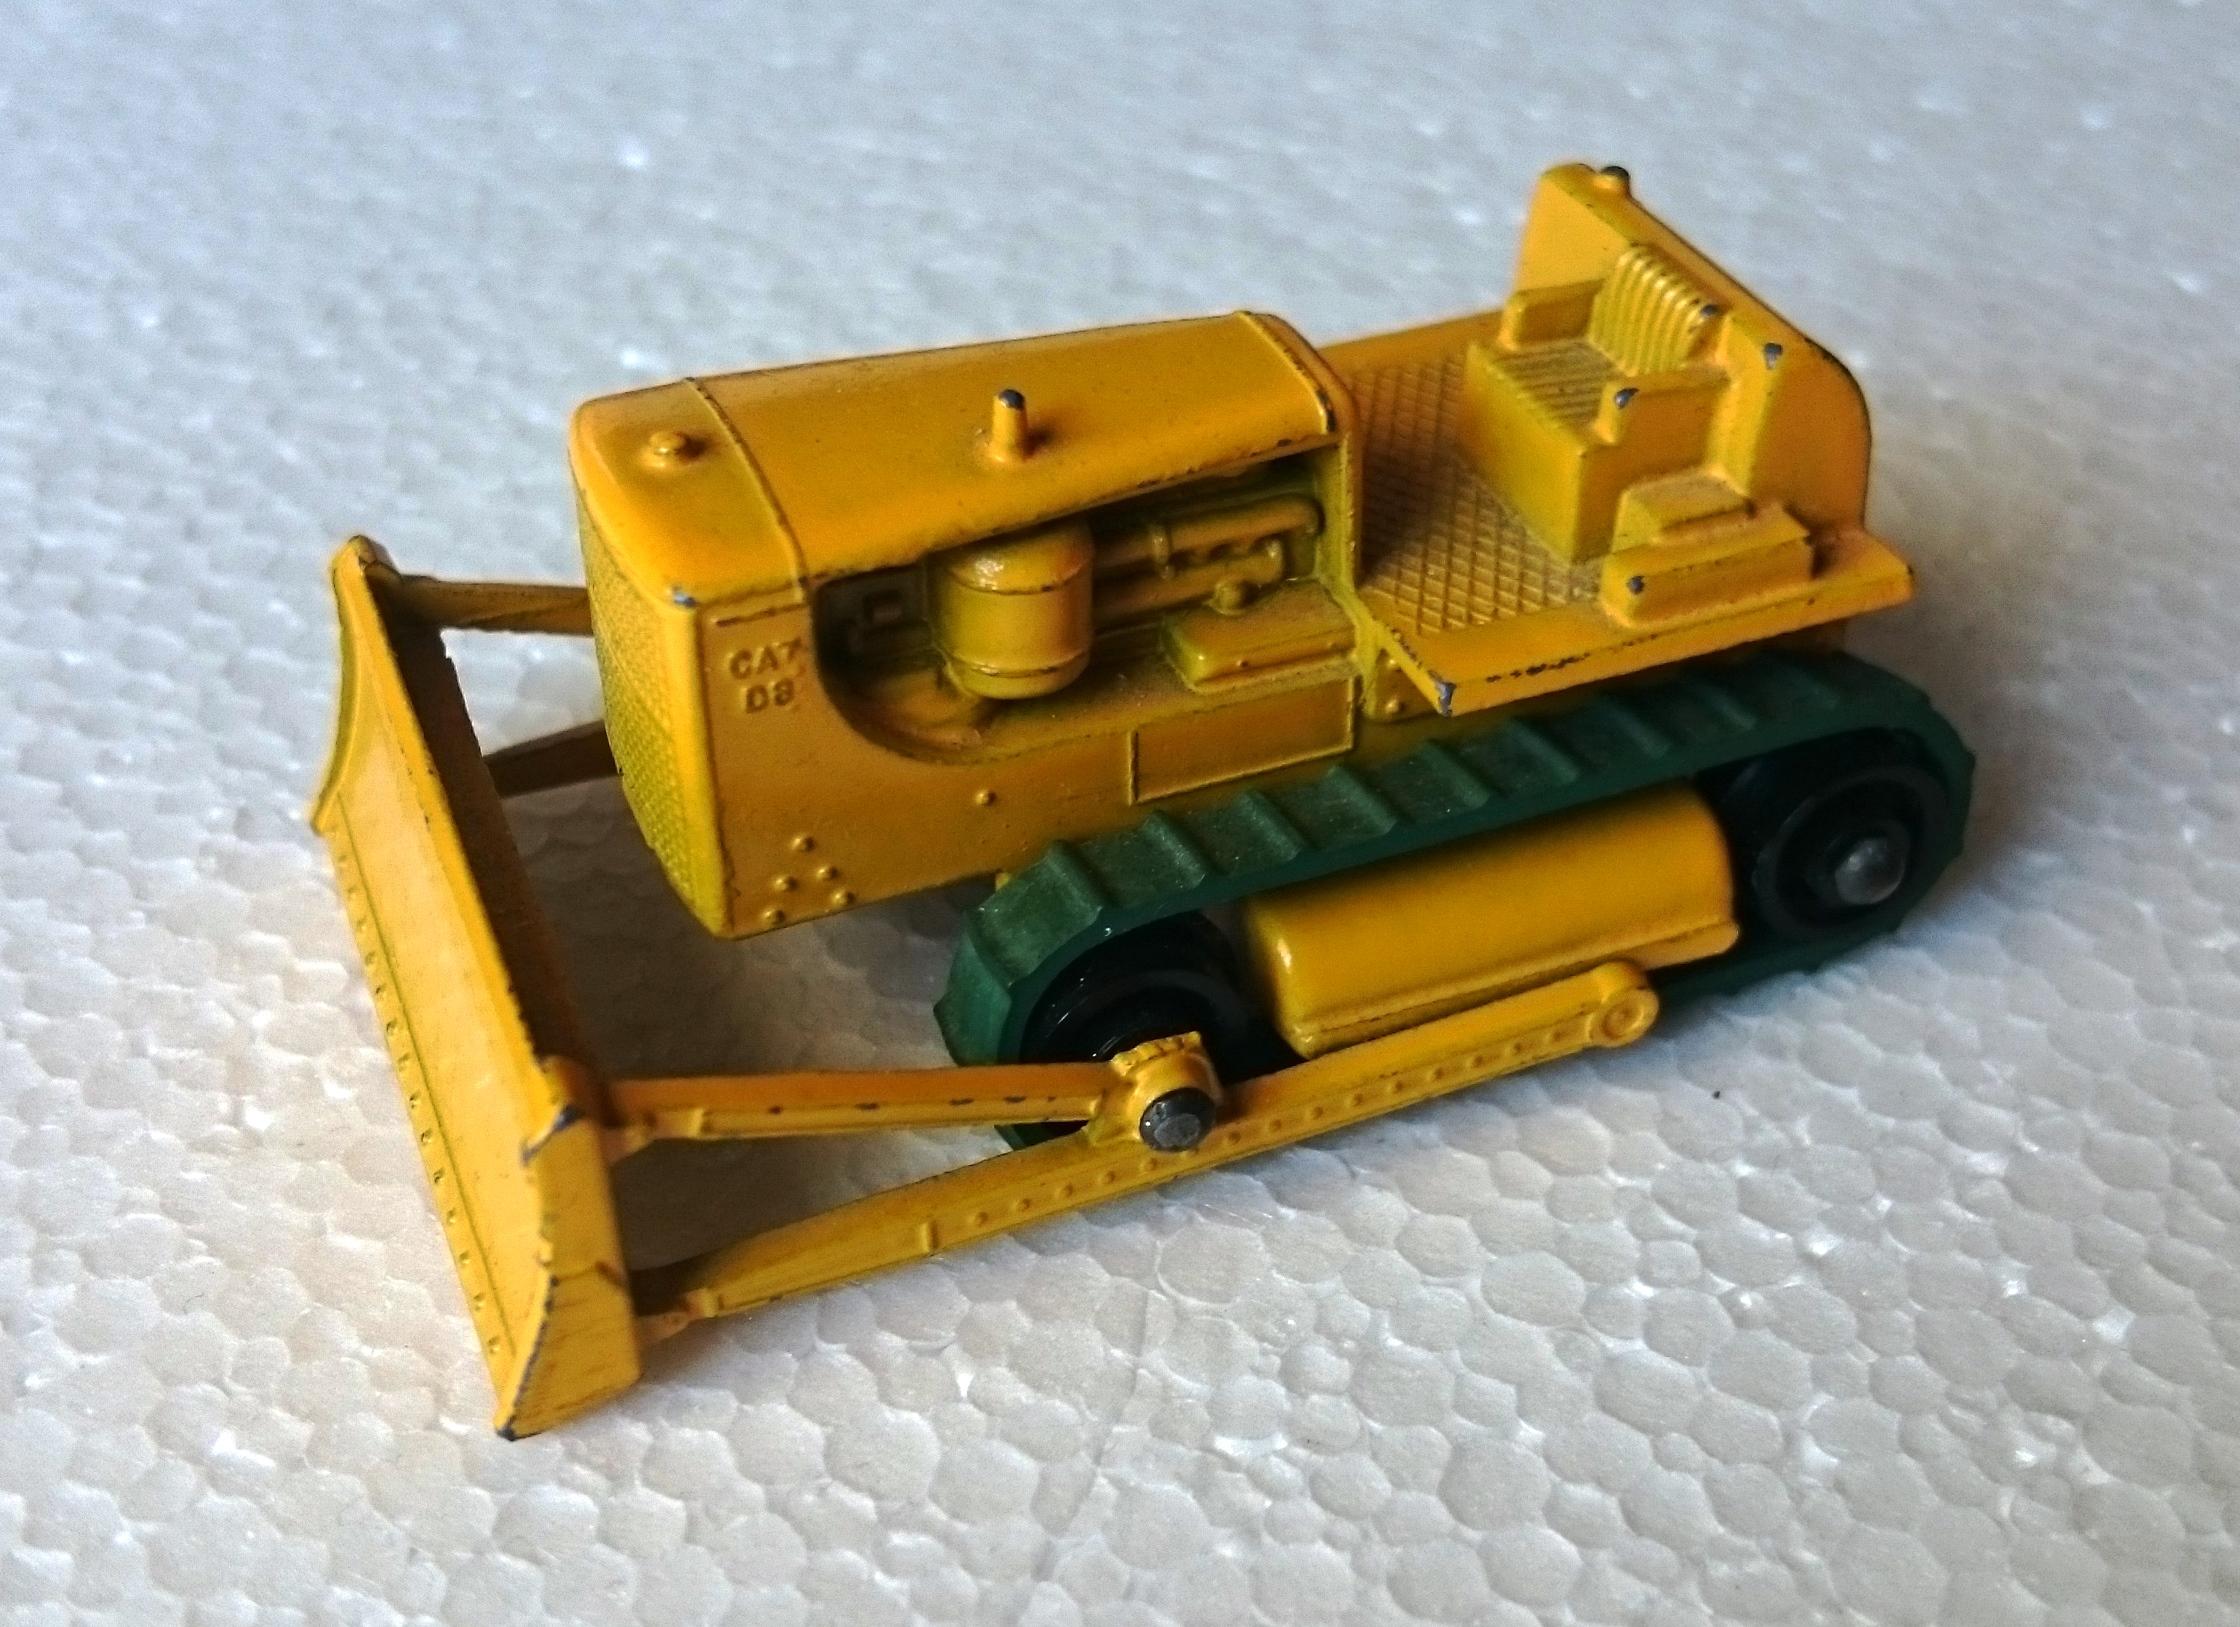 Caterpillar D8 Bulldozer (18-D)